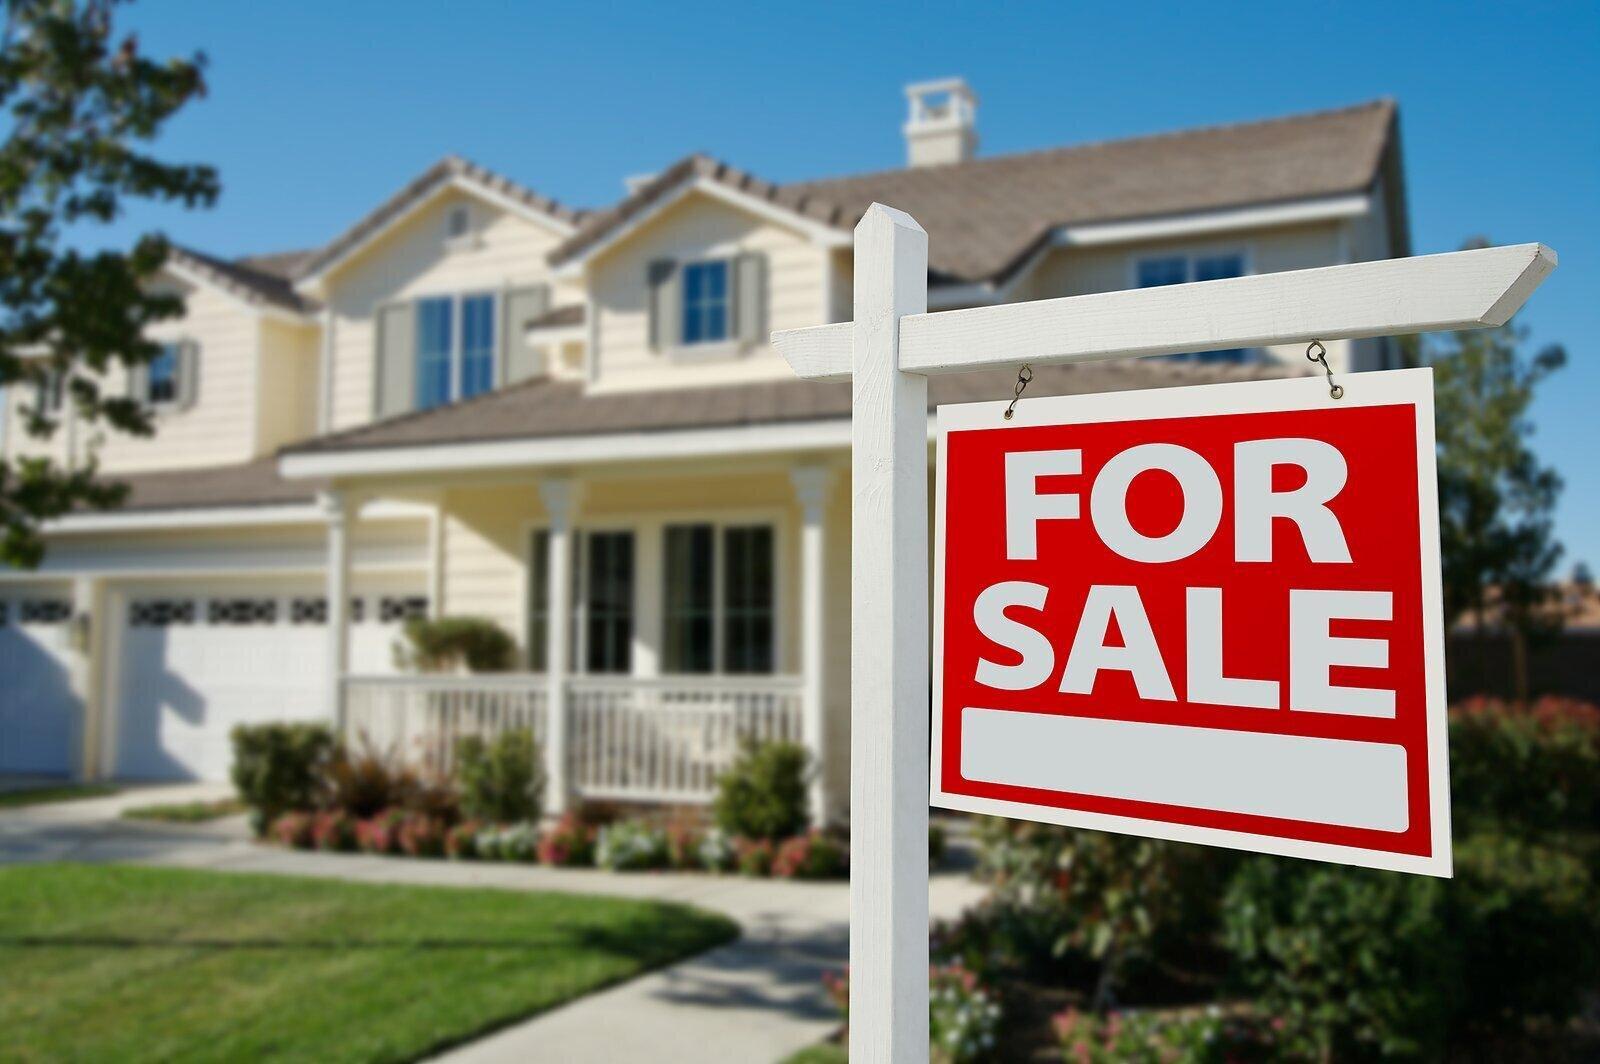 Sales of Housing in Kazakhstan 3.8% Down in 2020